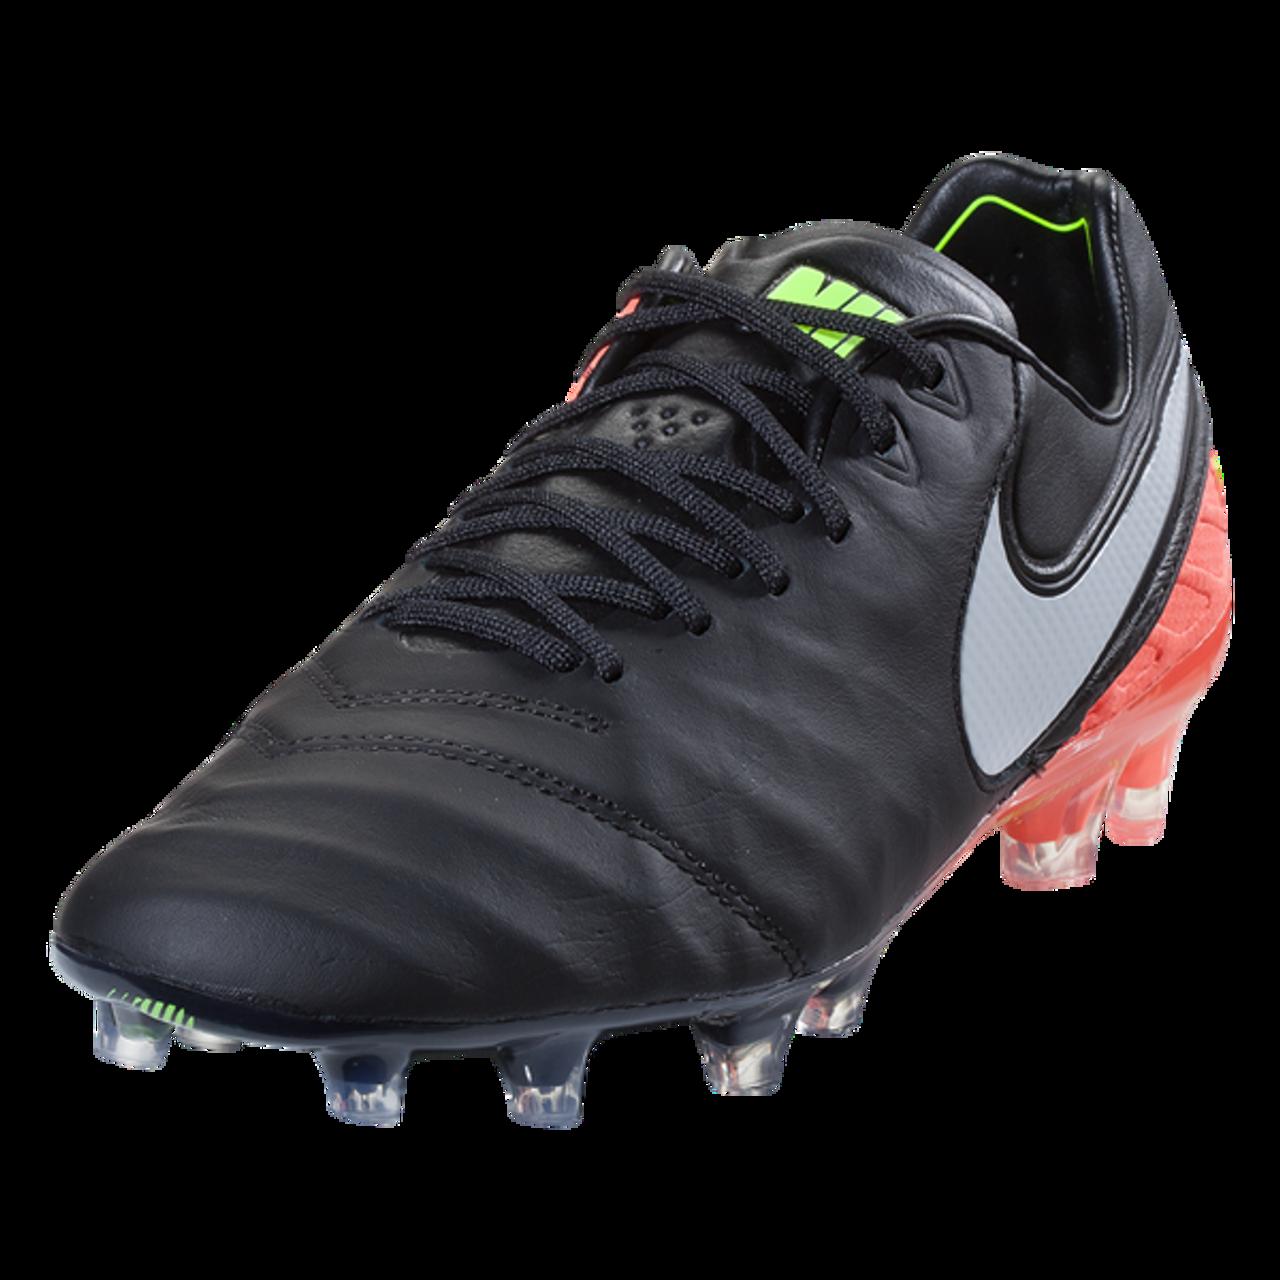 c8195498645b Nike Tiempo Legend VI FG - Black White Hyper Orange Volt (112917) - ohp  soccer